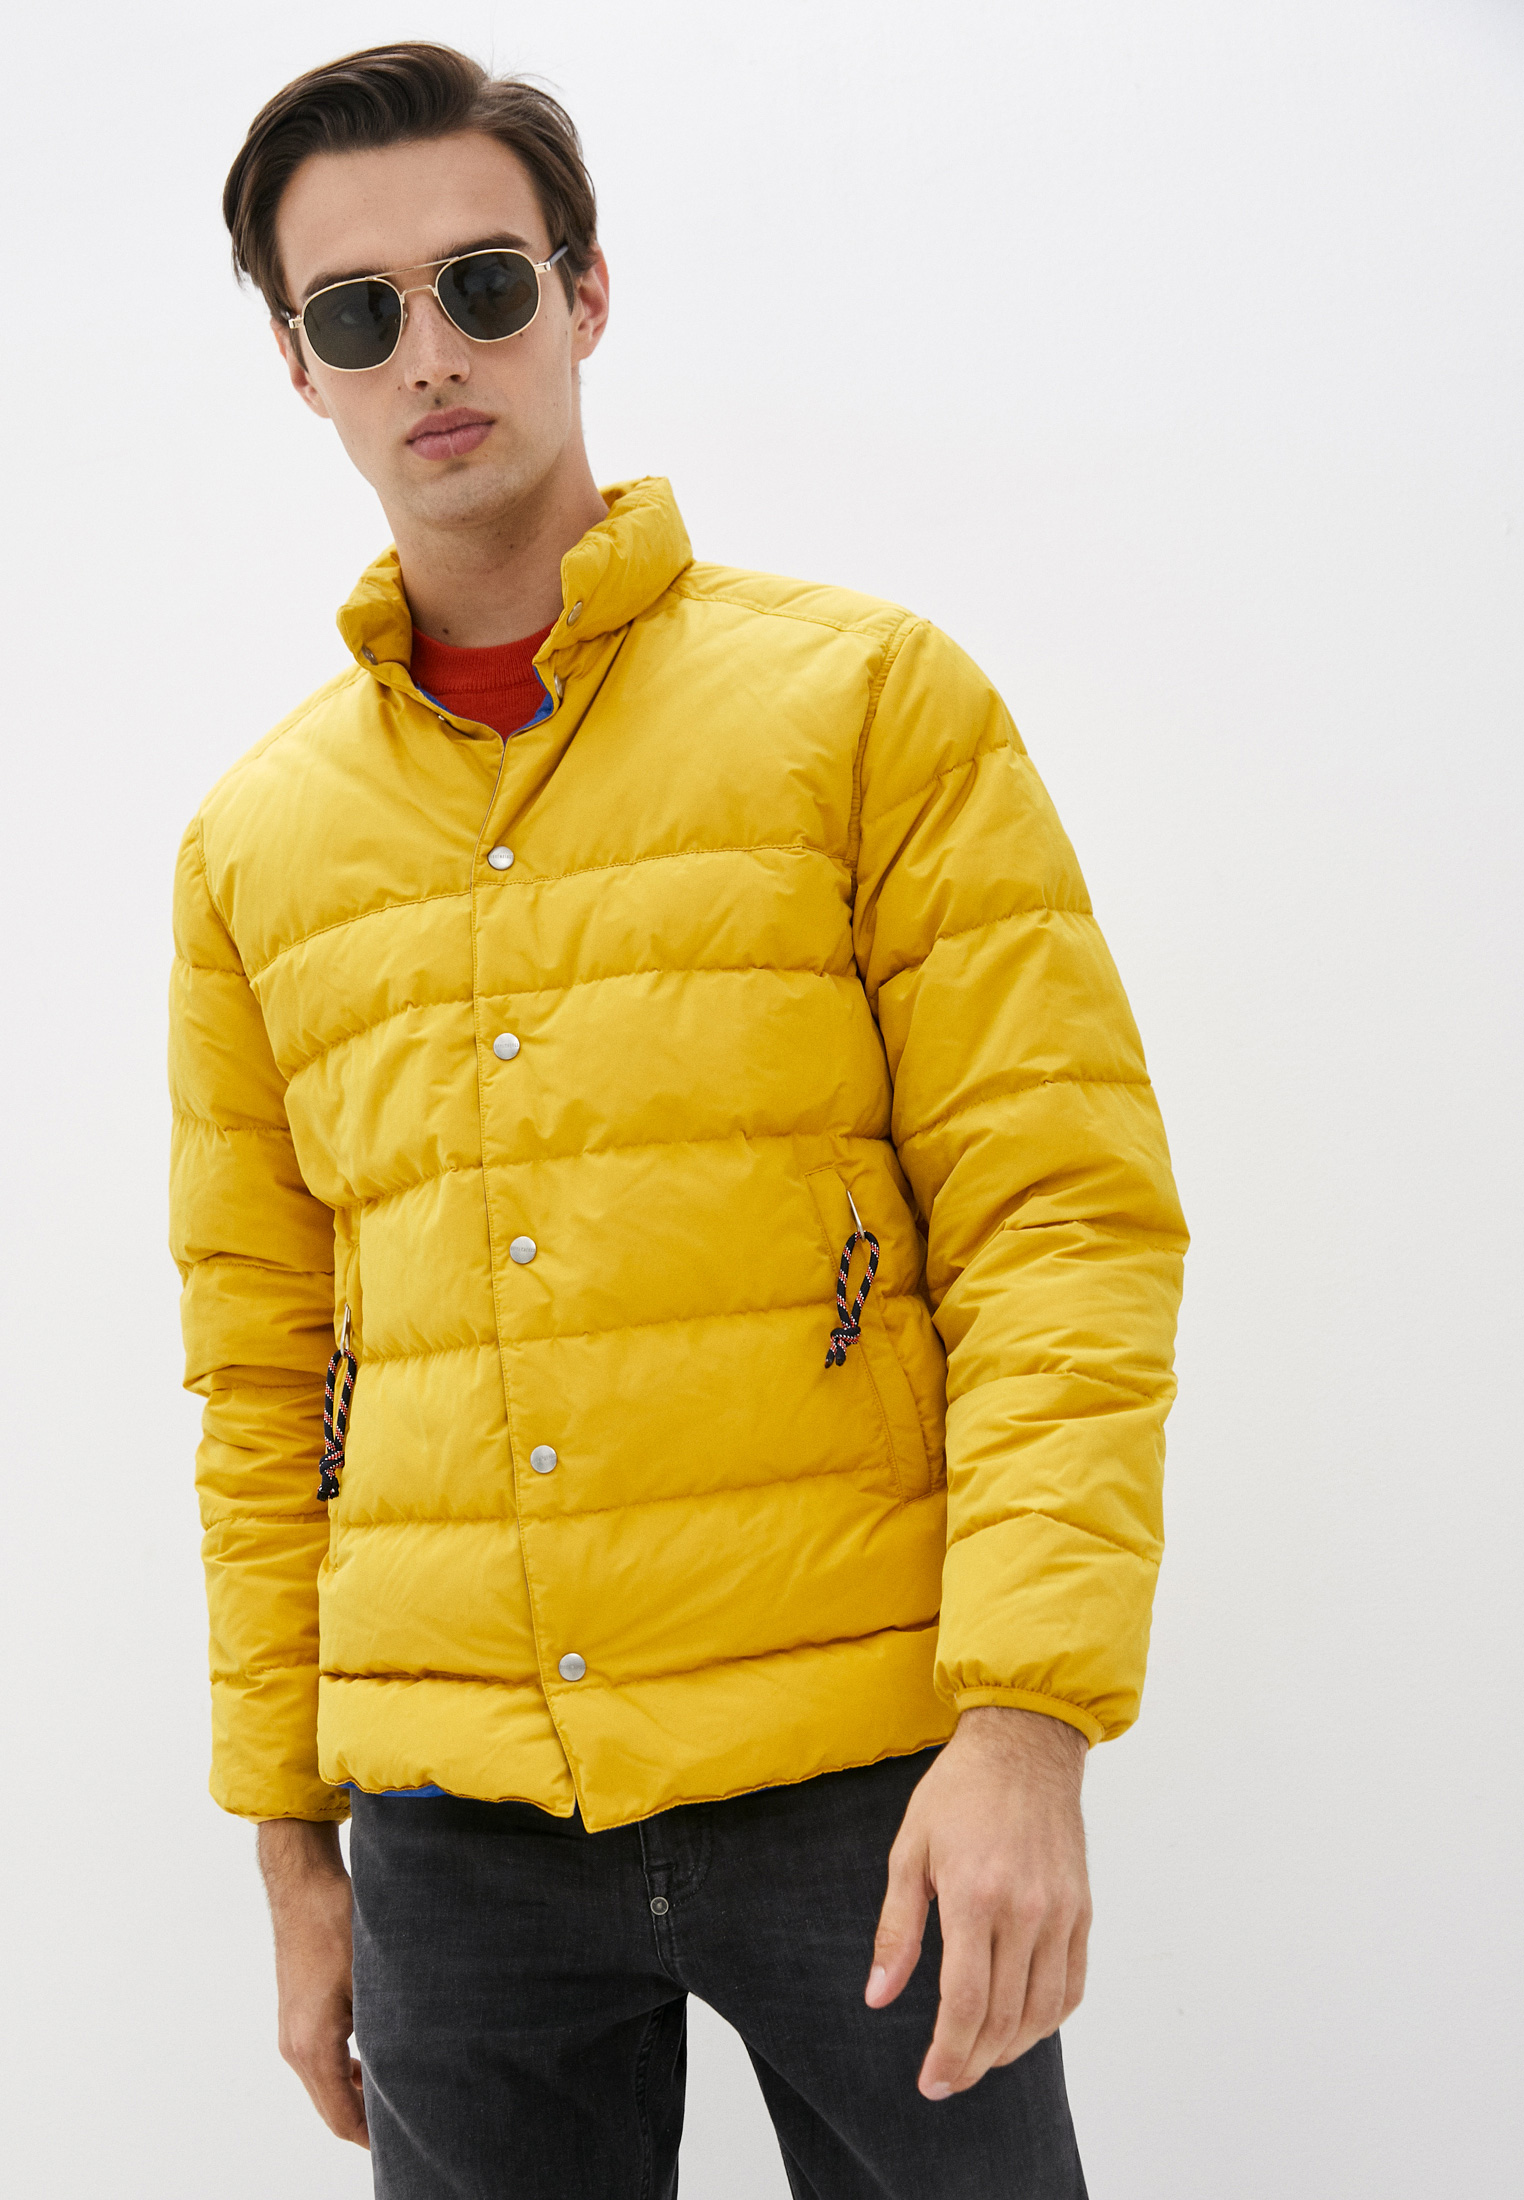 Мужская куртка Bikkembergs (Биккембергс) C H 087 00 T 9839: изображение 1